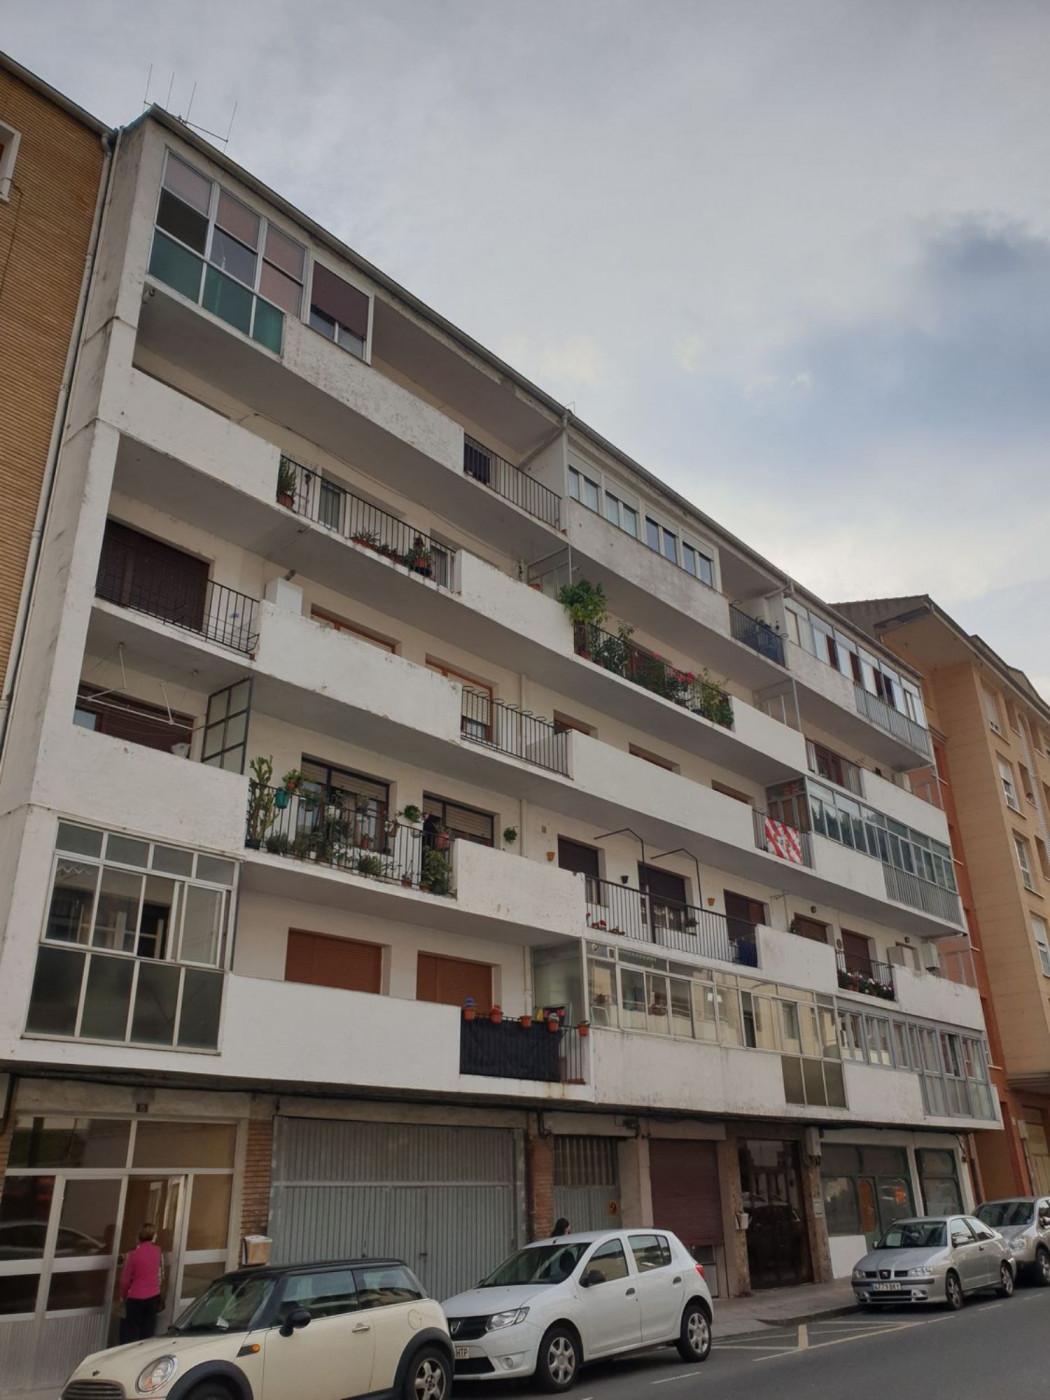 Flat for sale in Balmaseda, Balmaseda